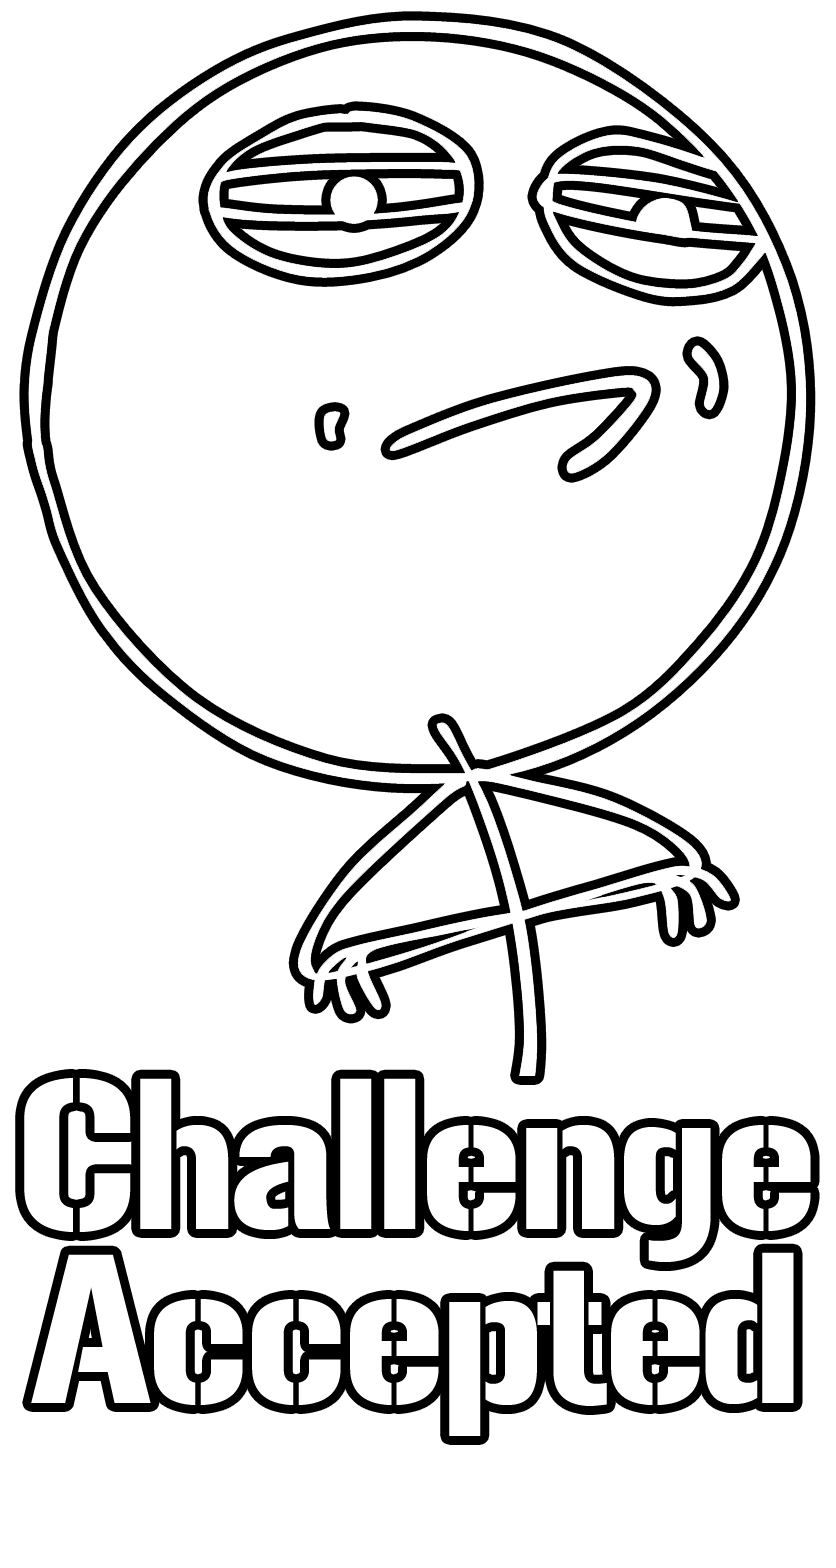 meme faces challenge accepted - photo #26